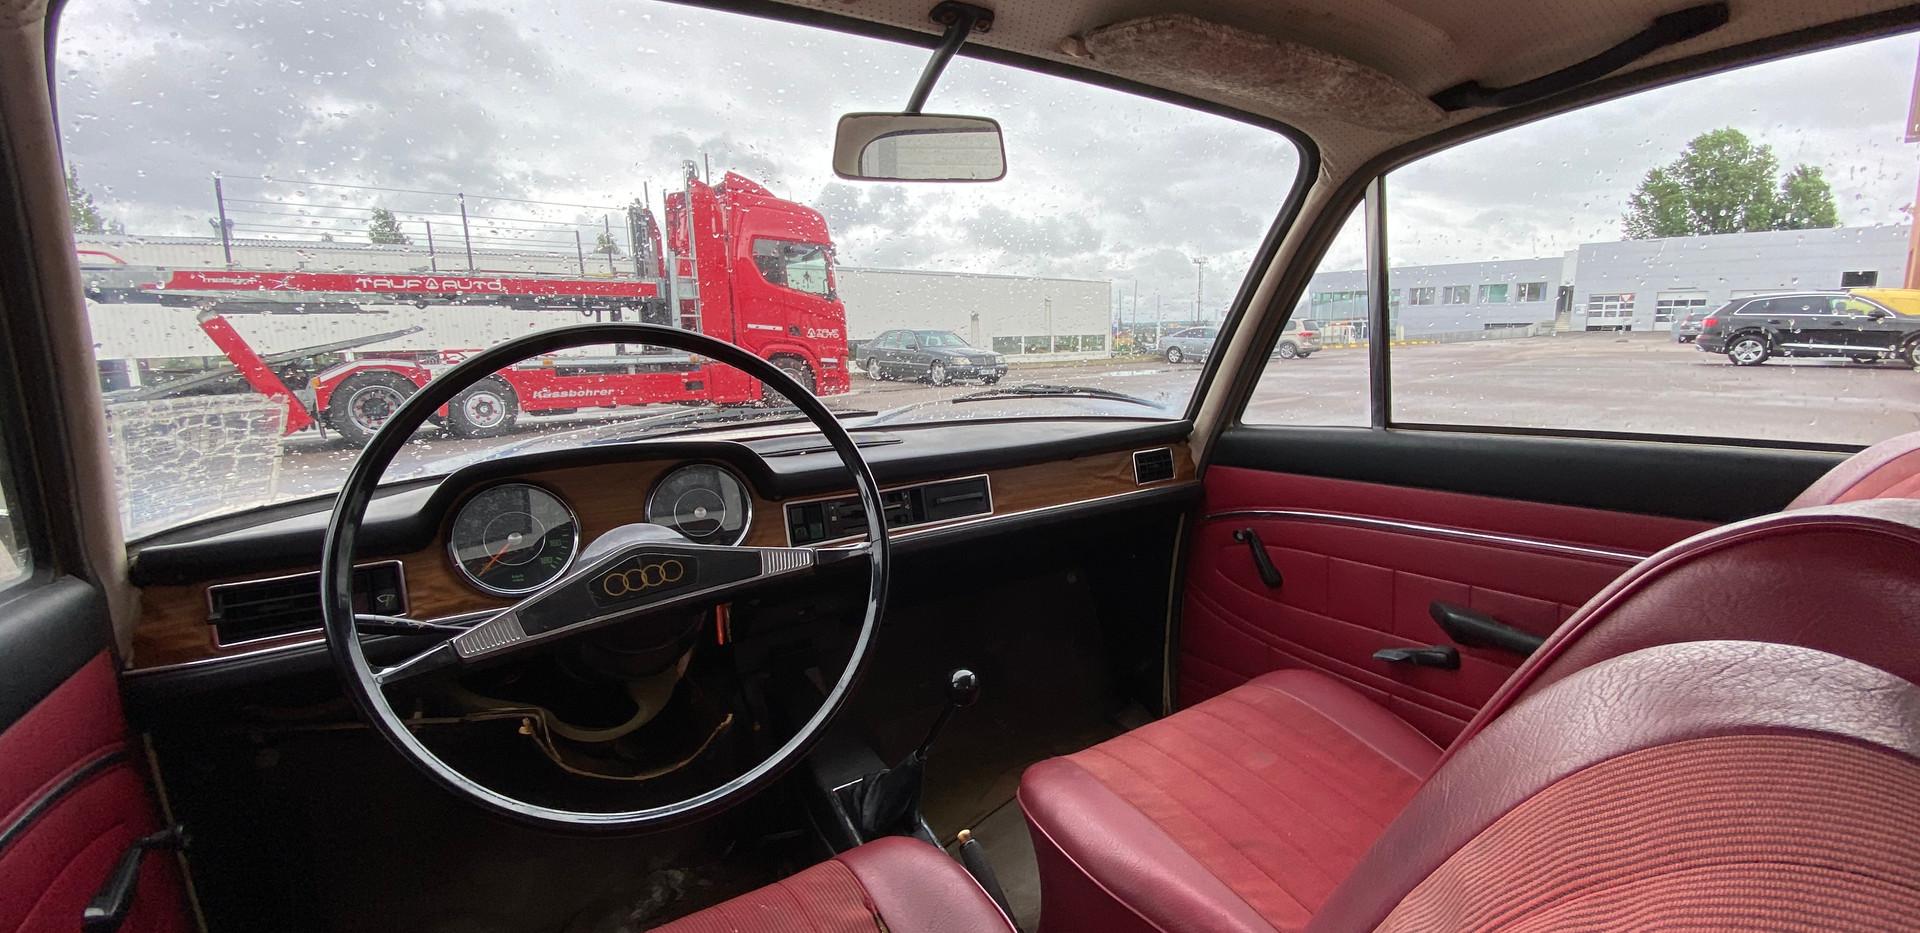 Audi 60 1971